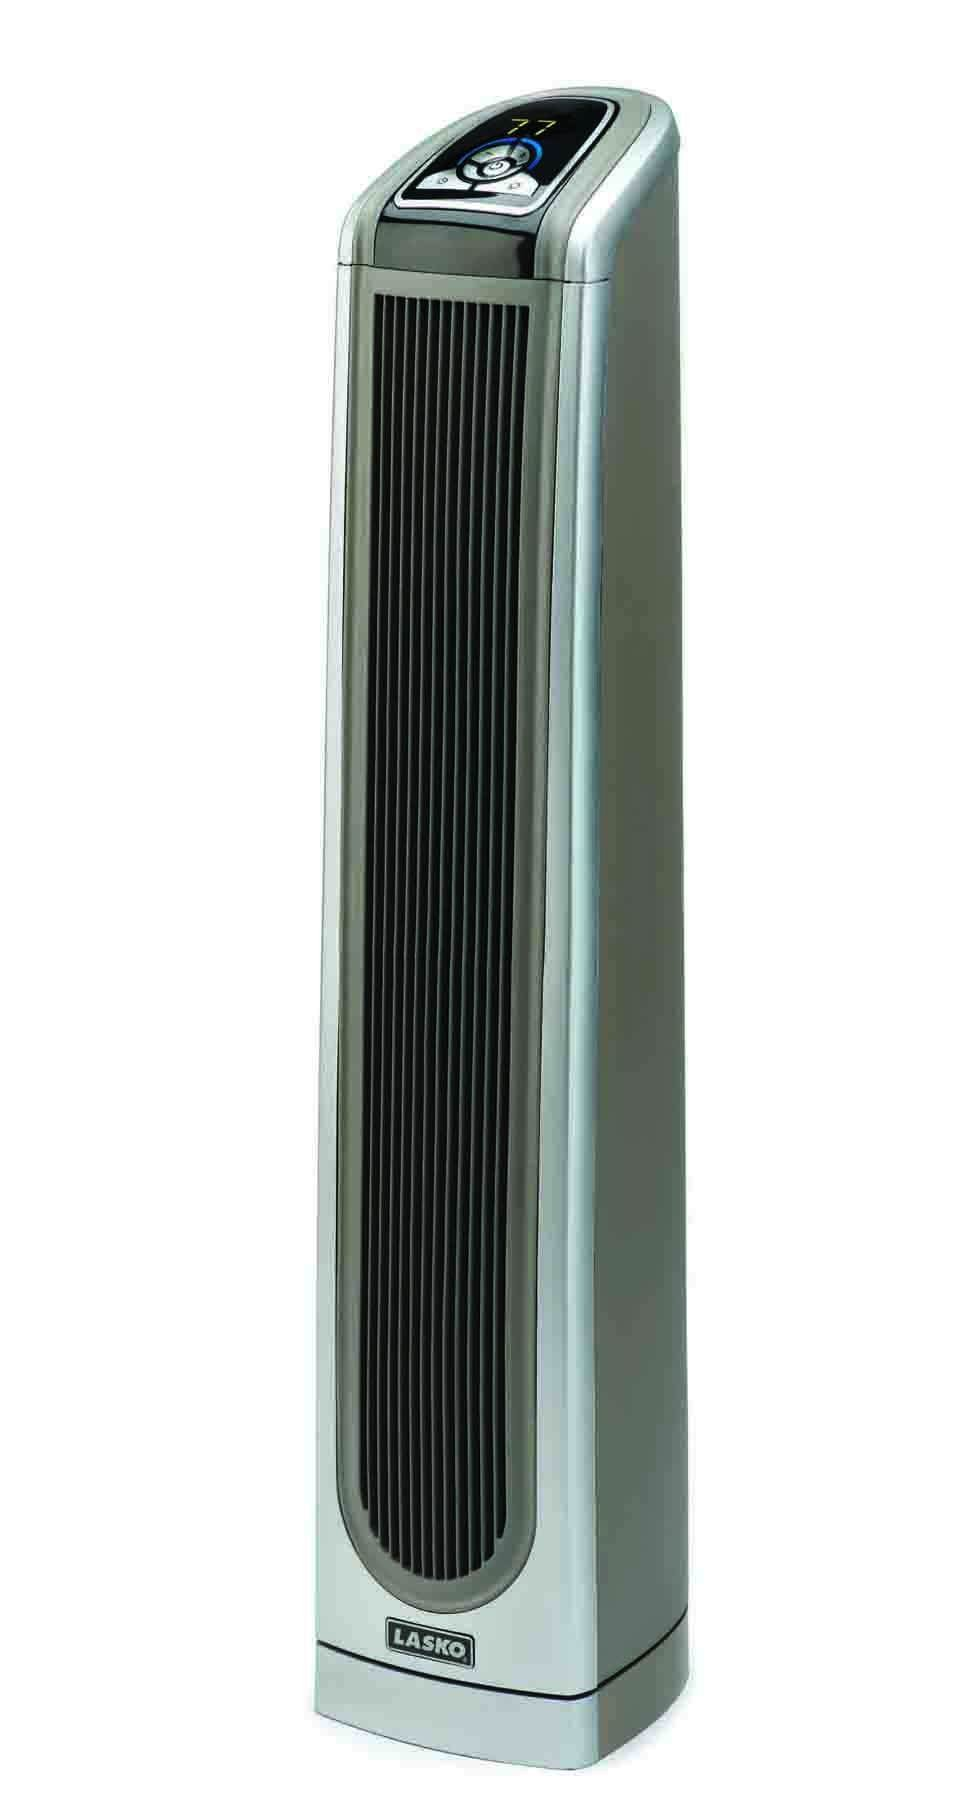 Lasko 5588 Ceramic Tower Heater with Remote